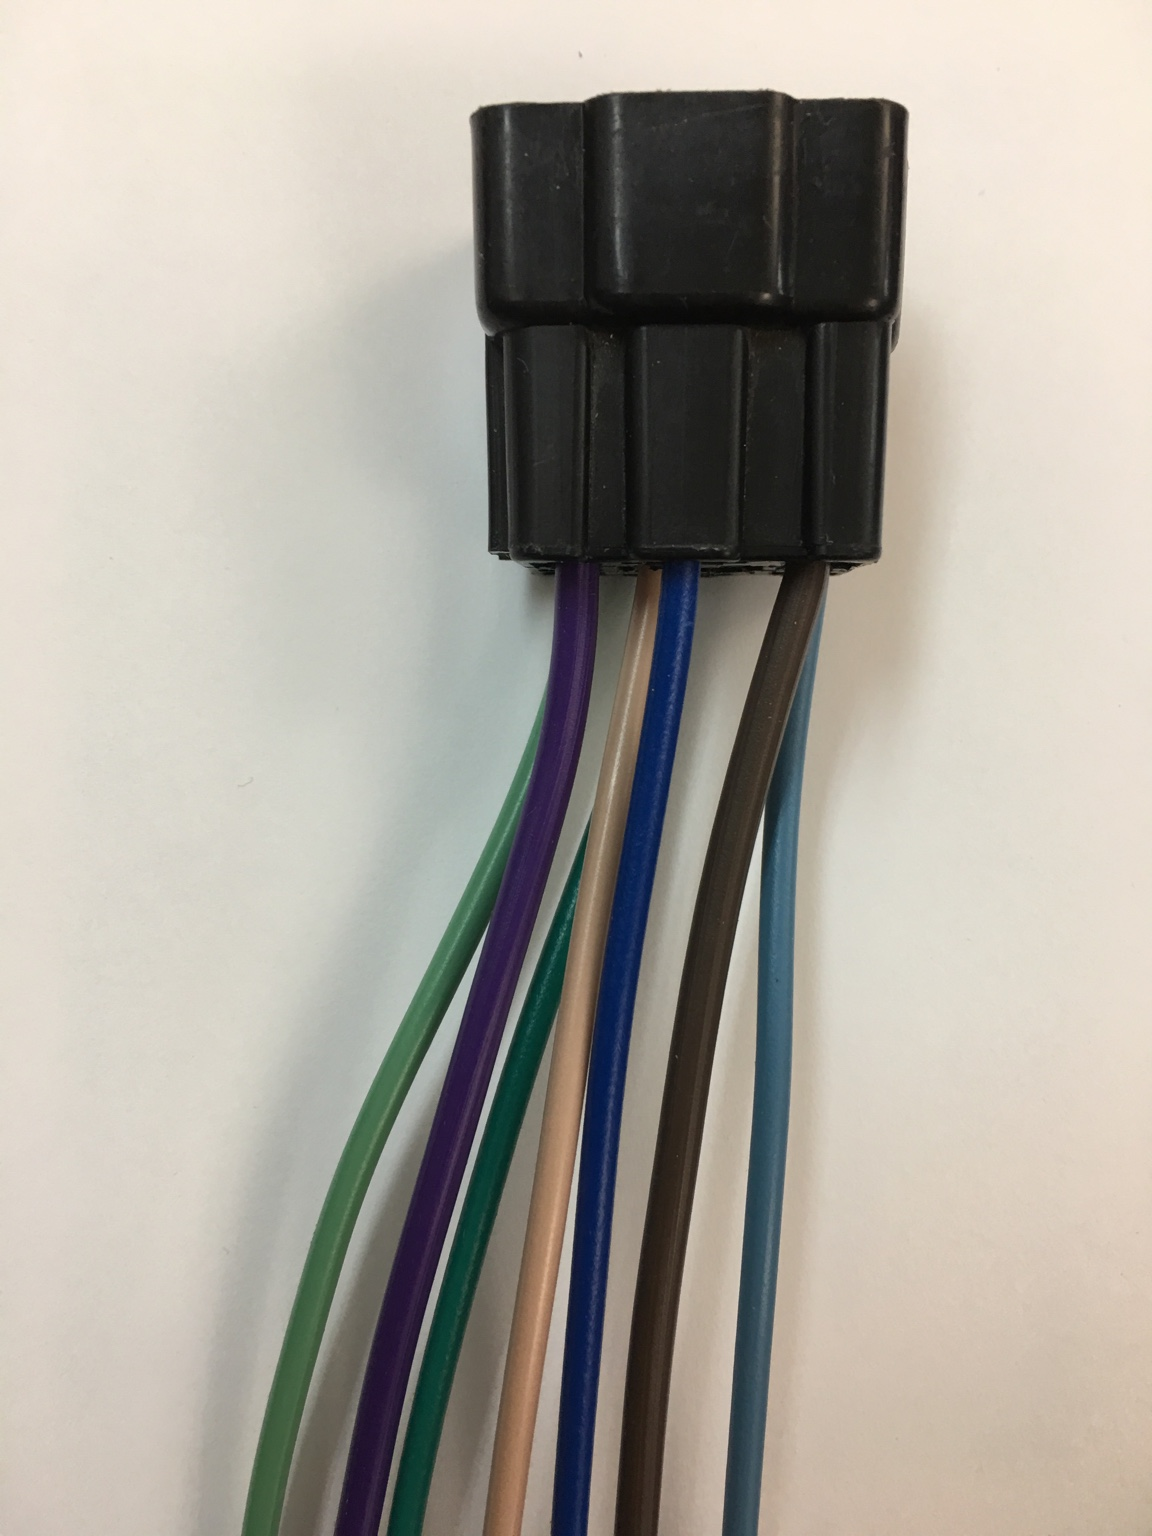 Firewall Plug